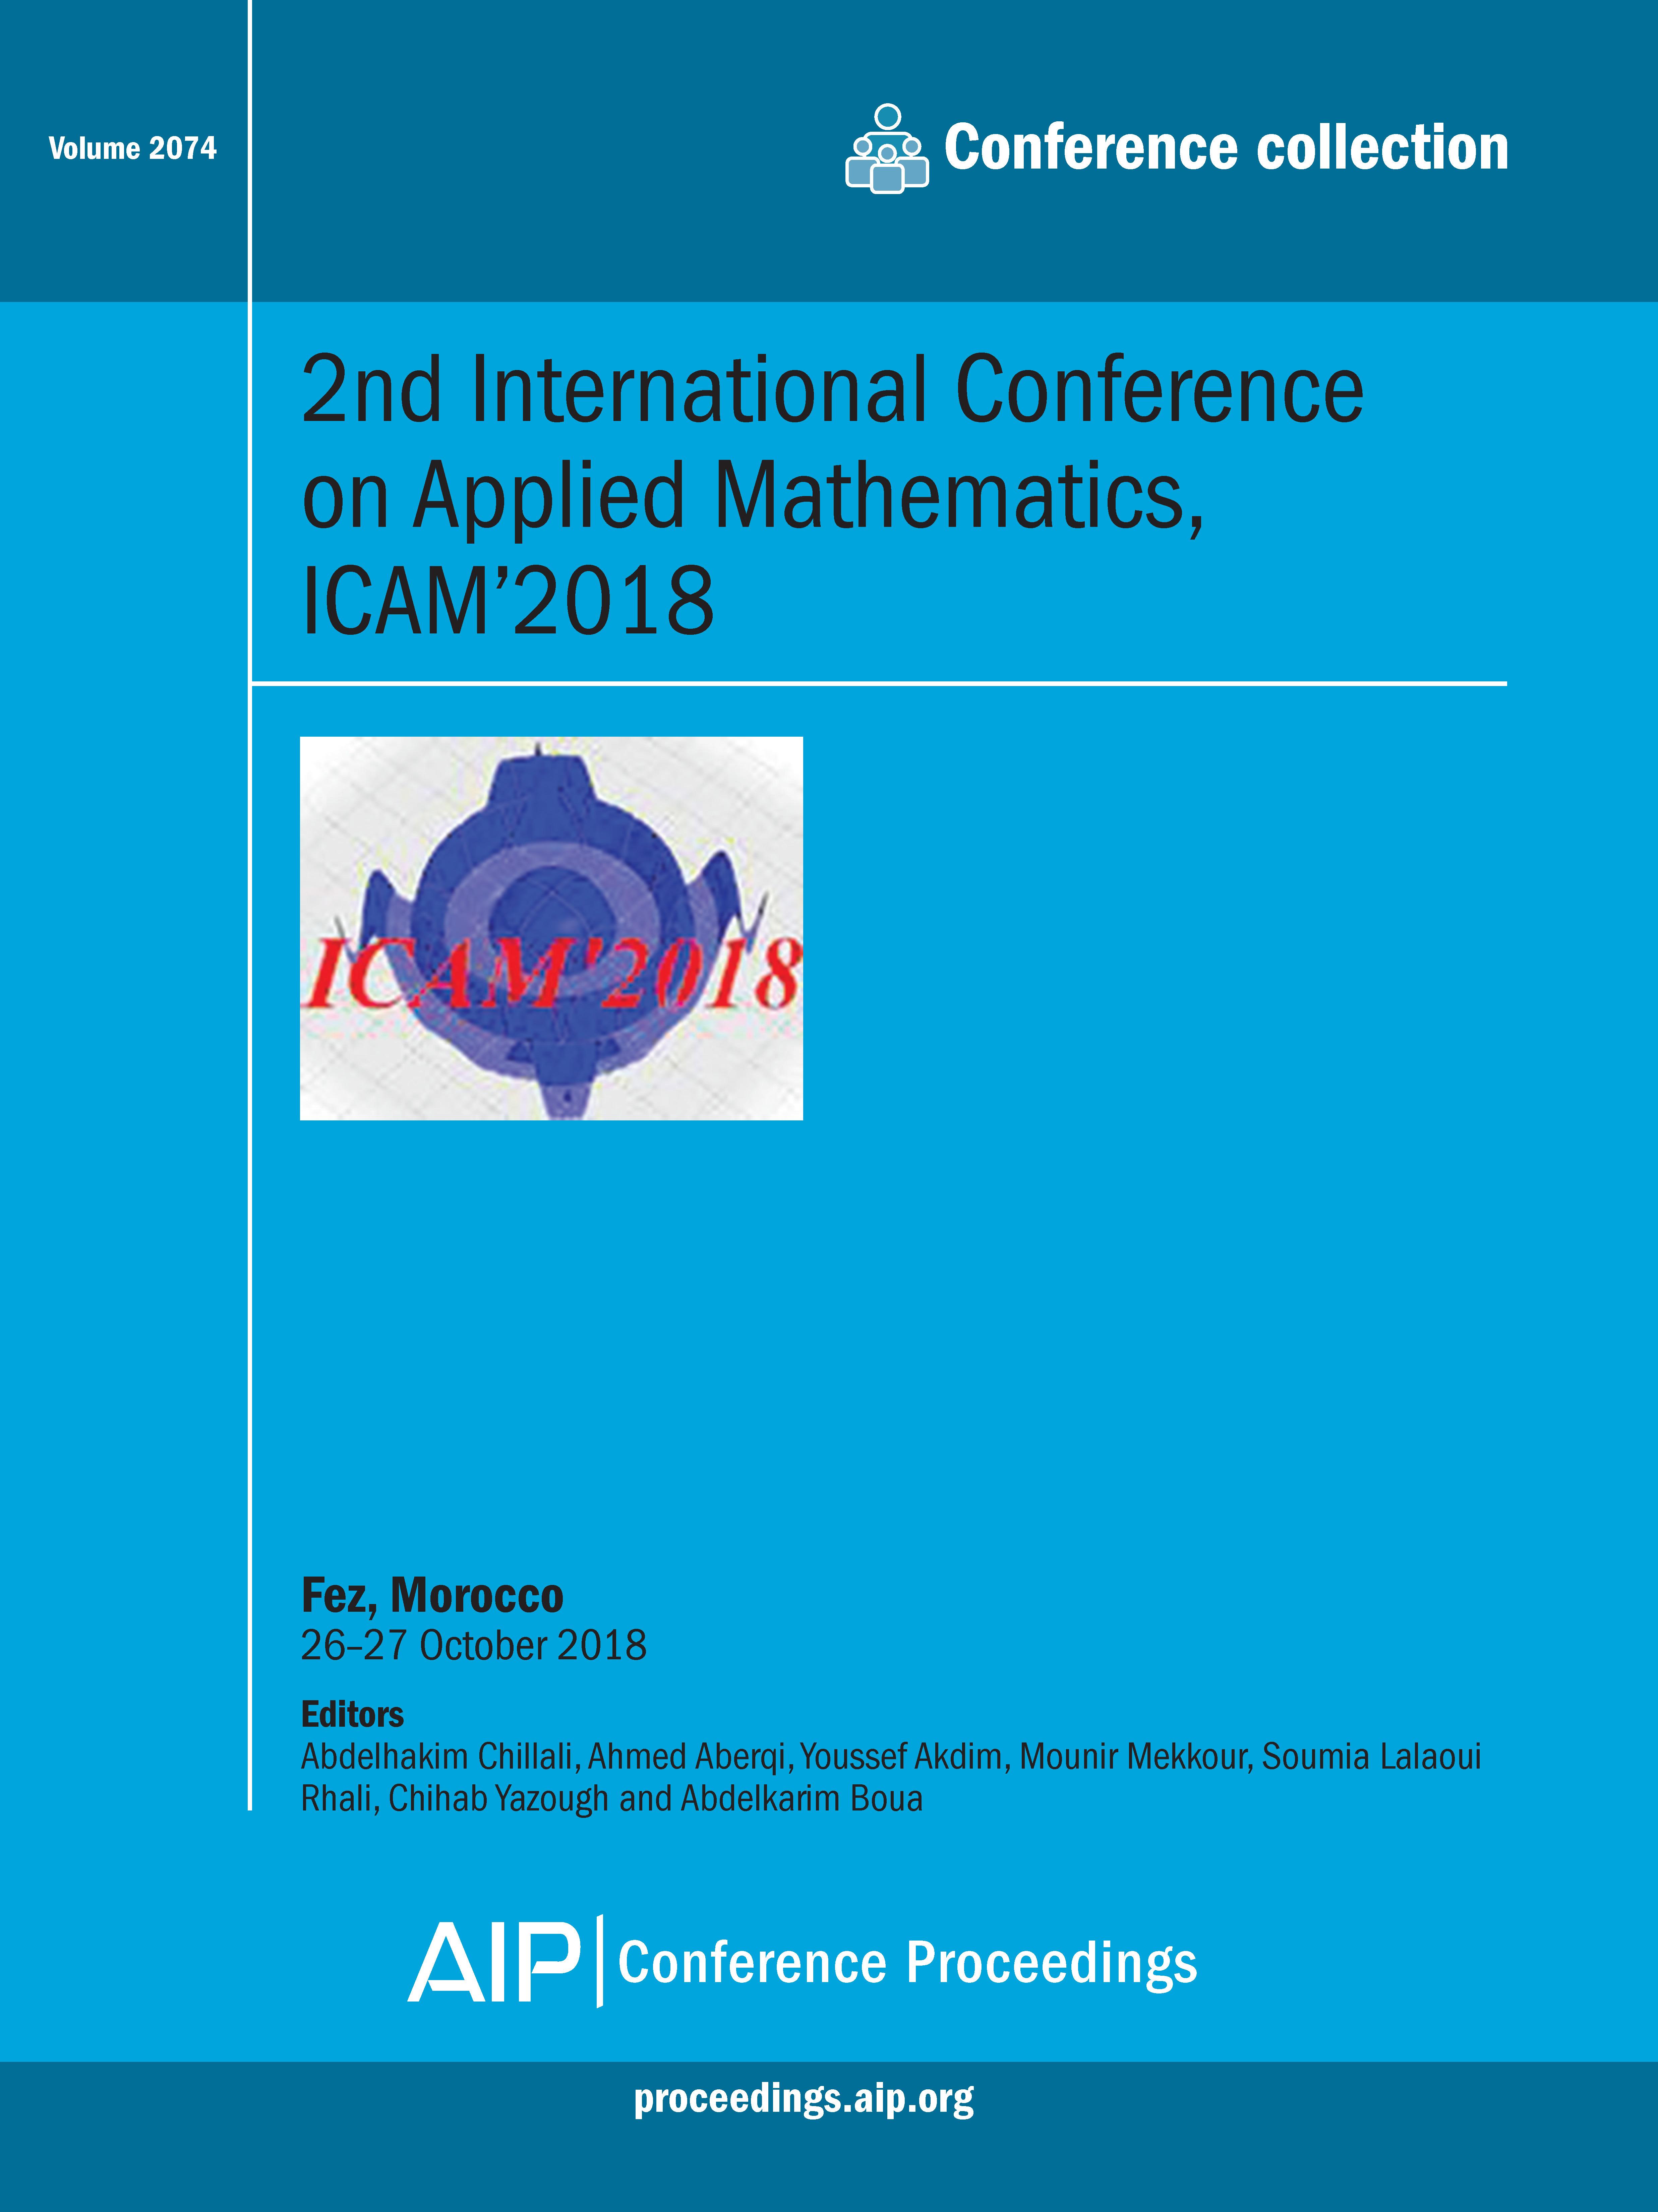 Volume 2074: 2nd International Conference On Applied Mathematics